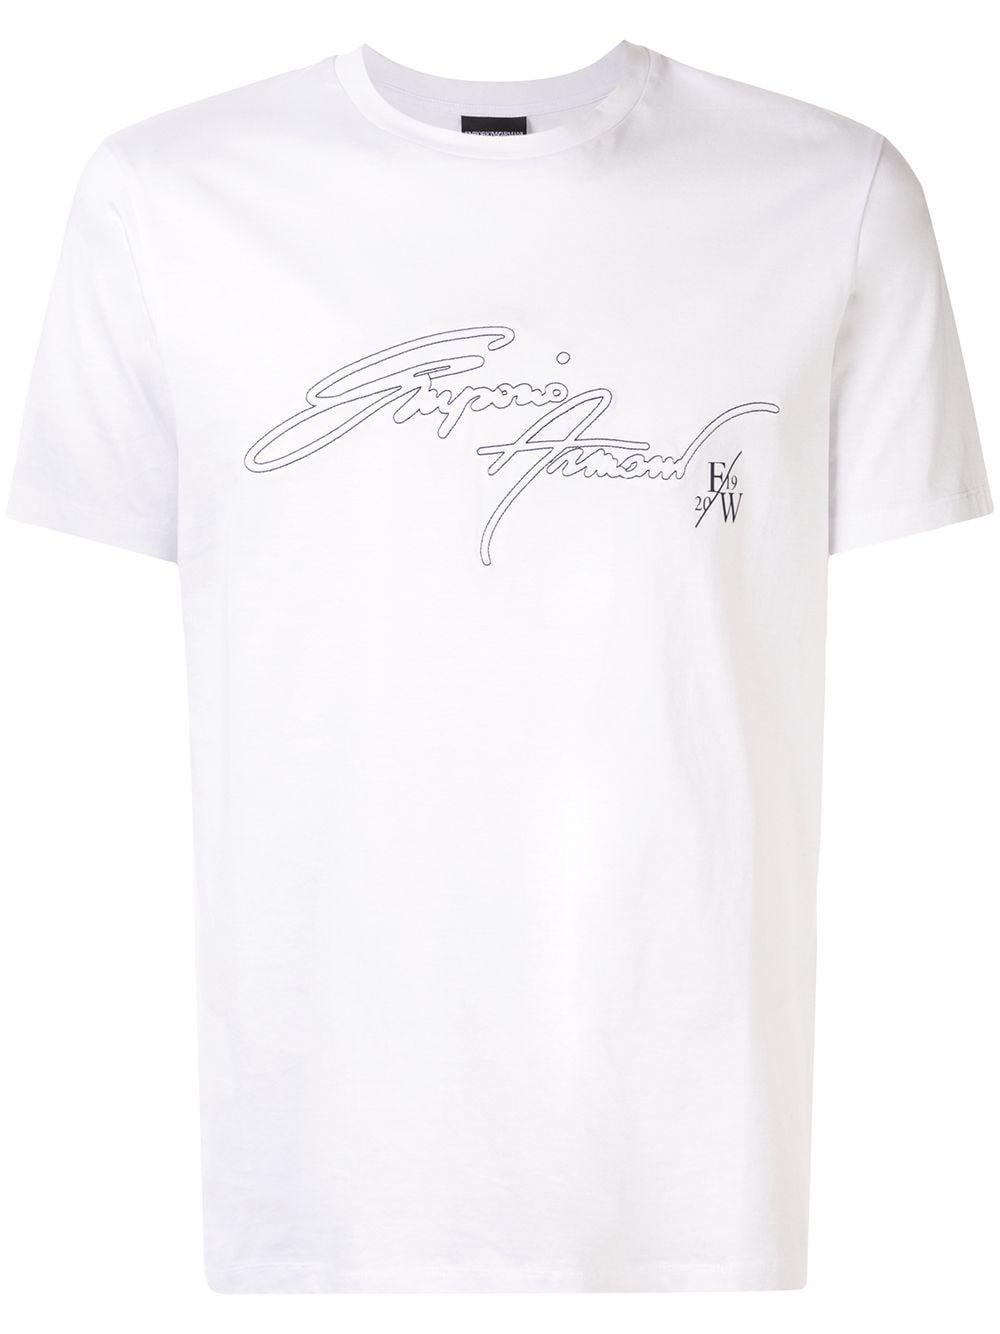 Emporio Armani Logo T Shirt White In 2019 Armani Logo Emporio